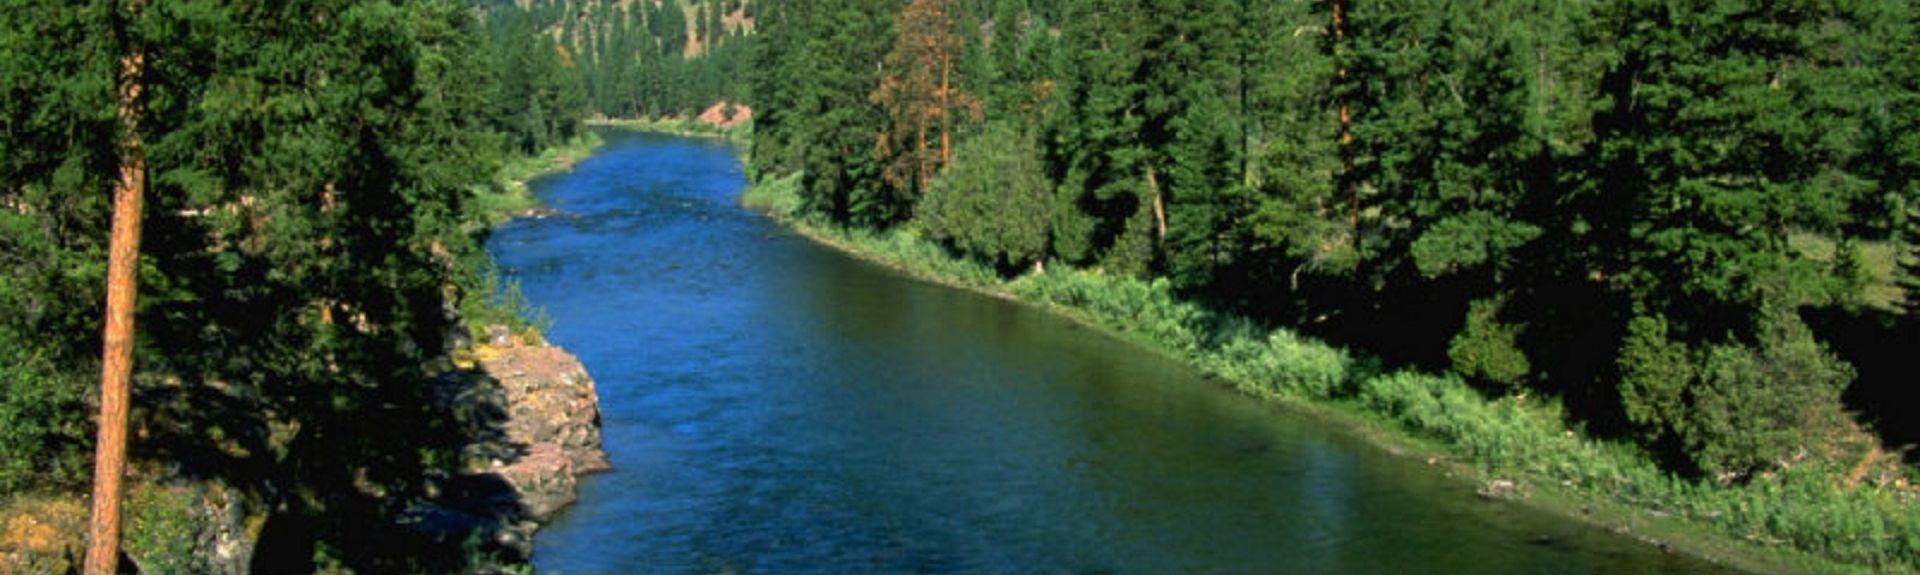 Paradise, Montana, Estados Unidos